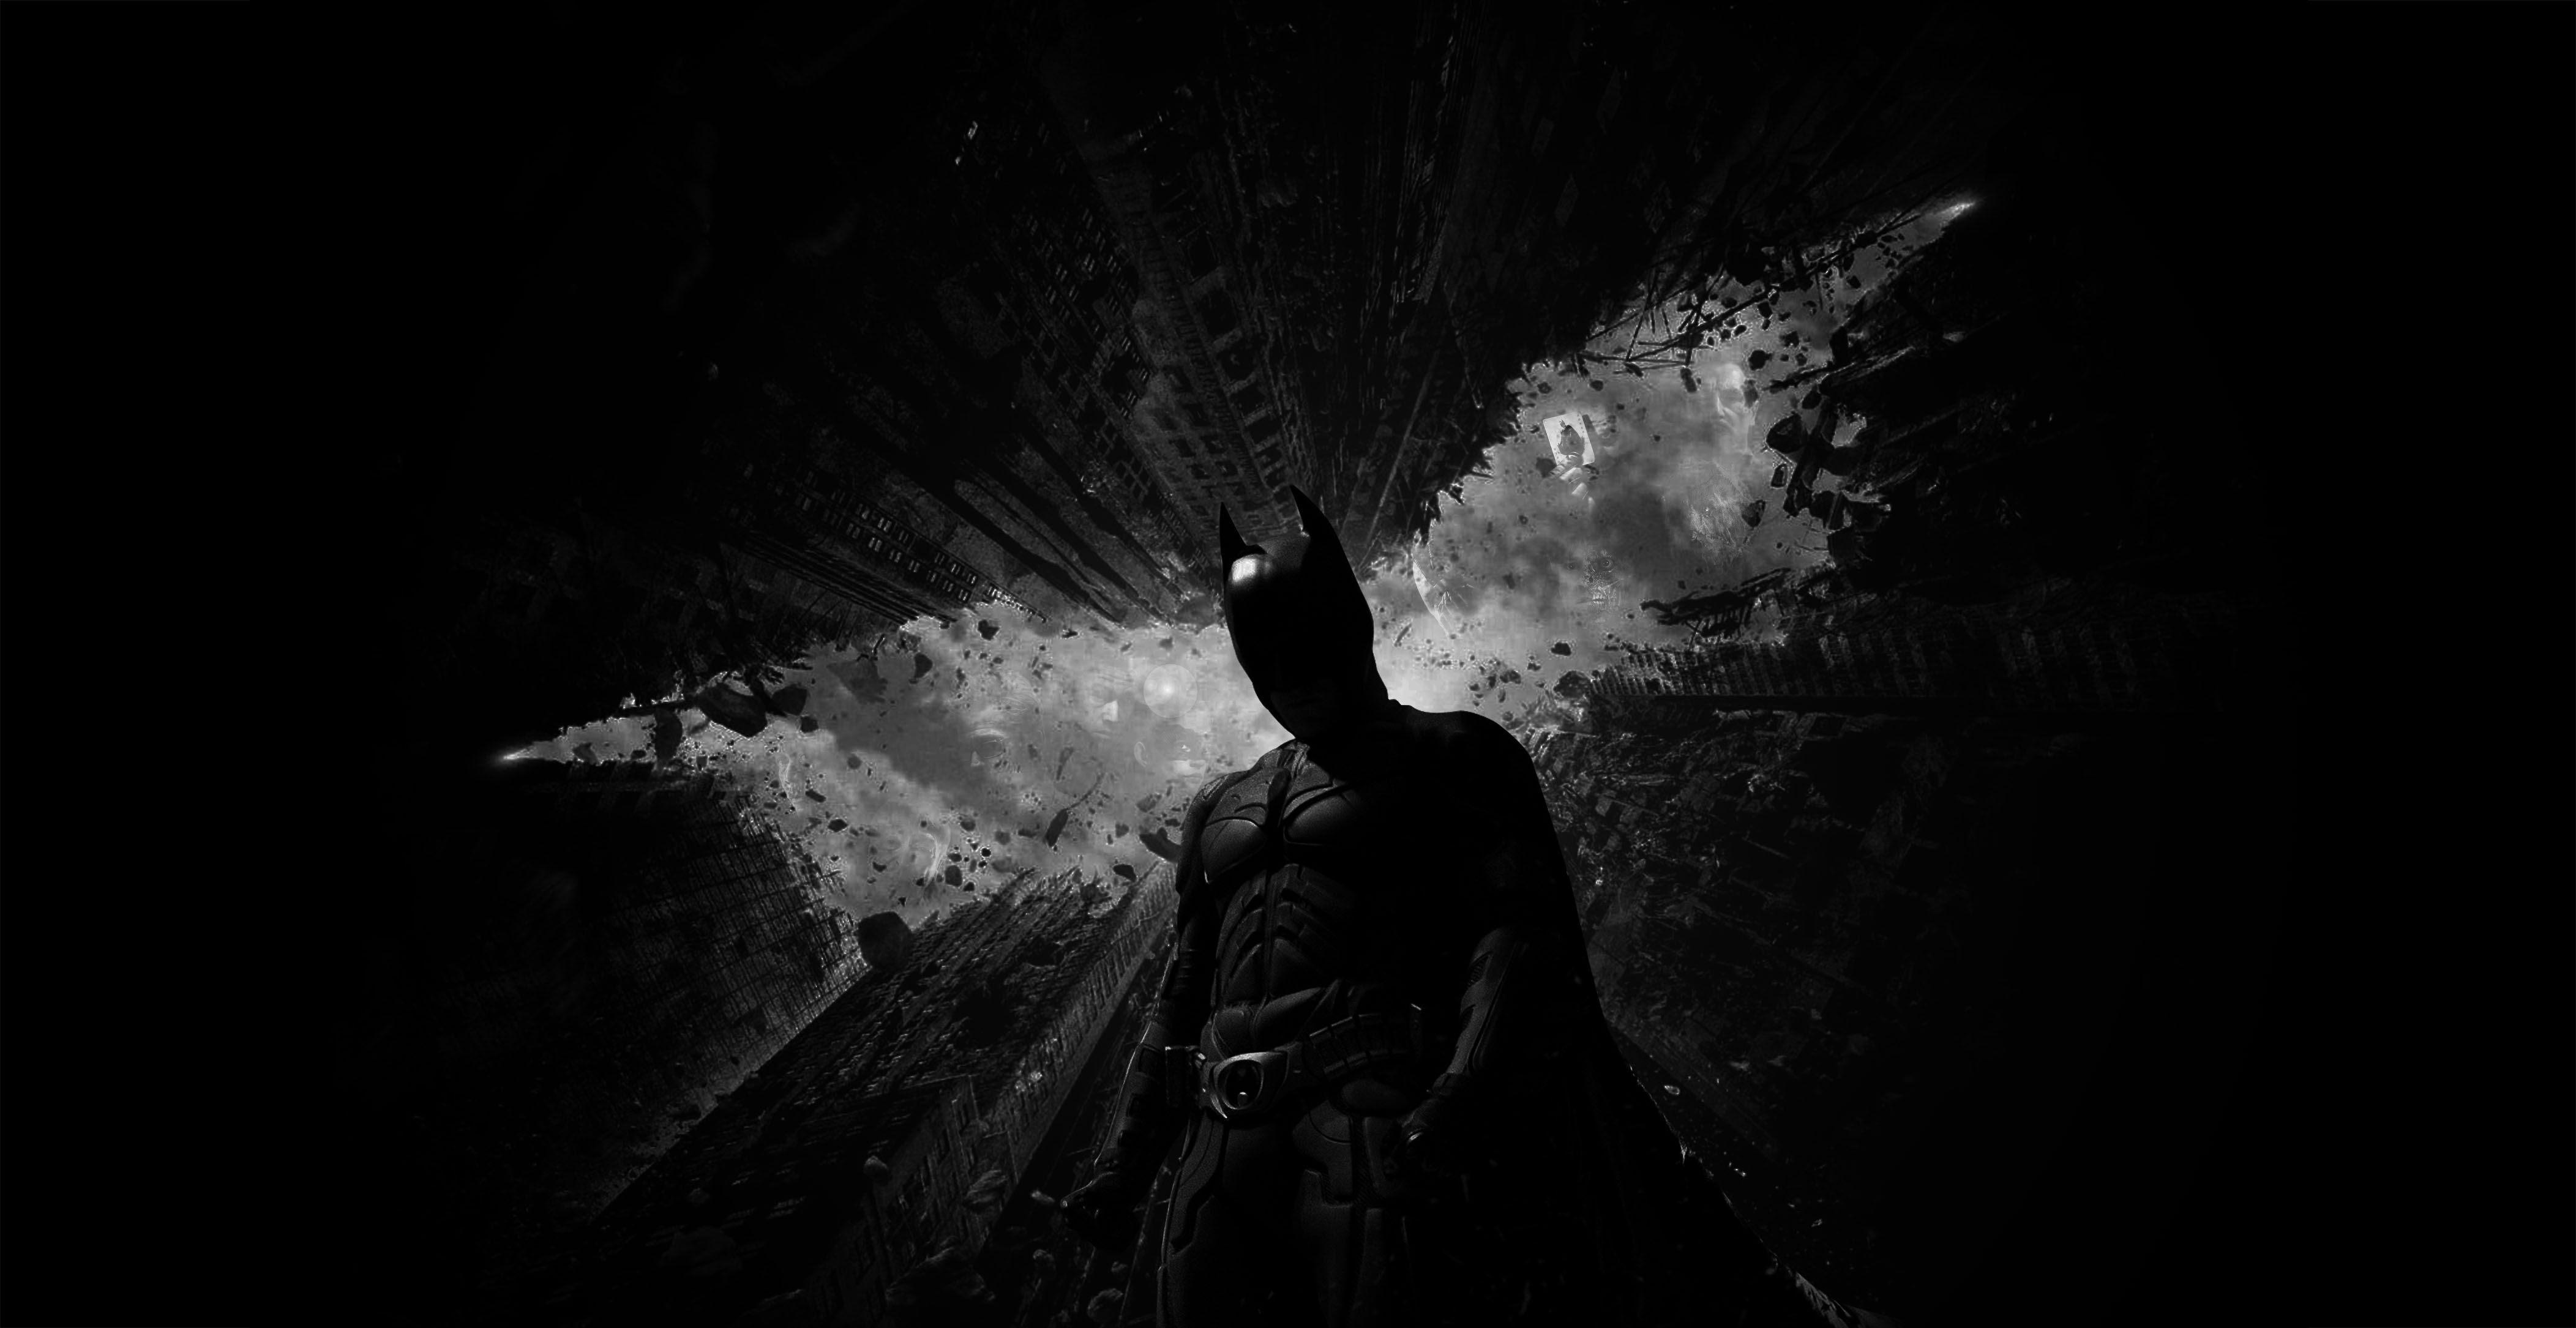 Batman The Dark Knight Wallpaper For Iphone Desktop Background 4208x2170 Px 36163 KB